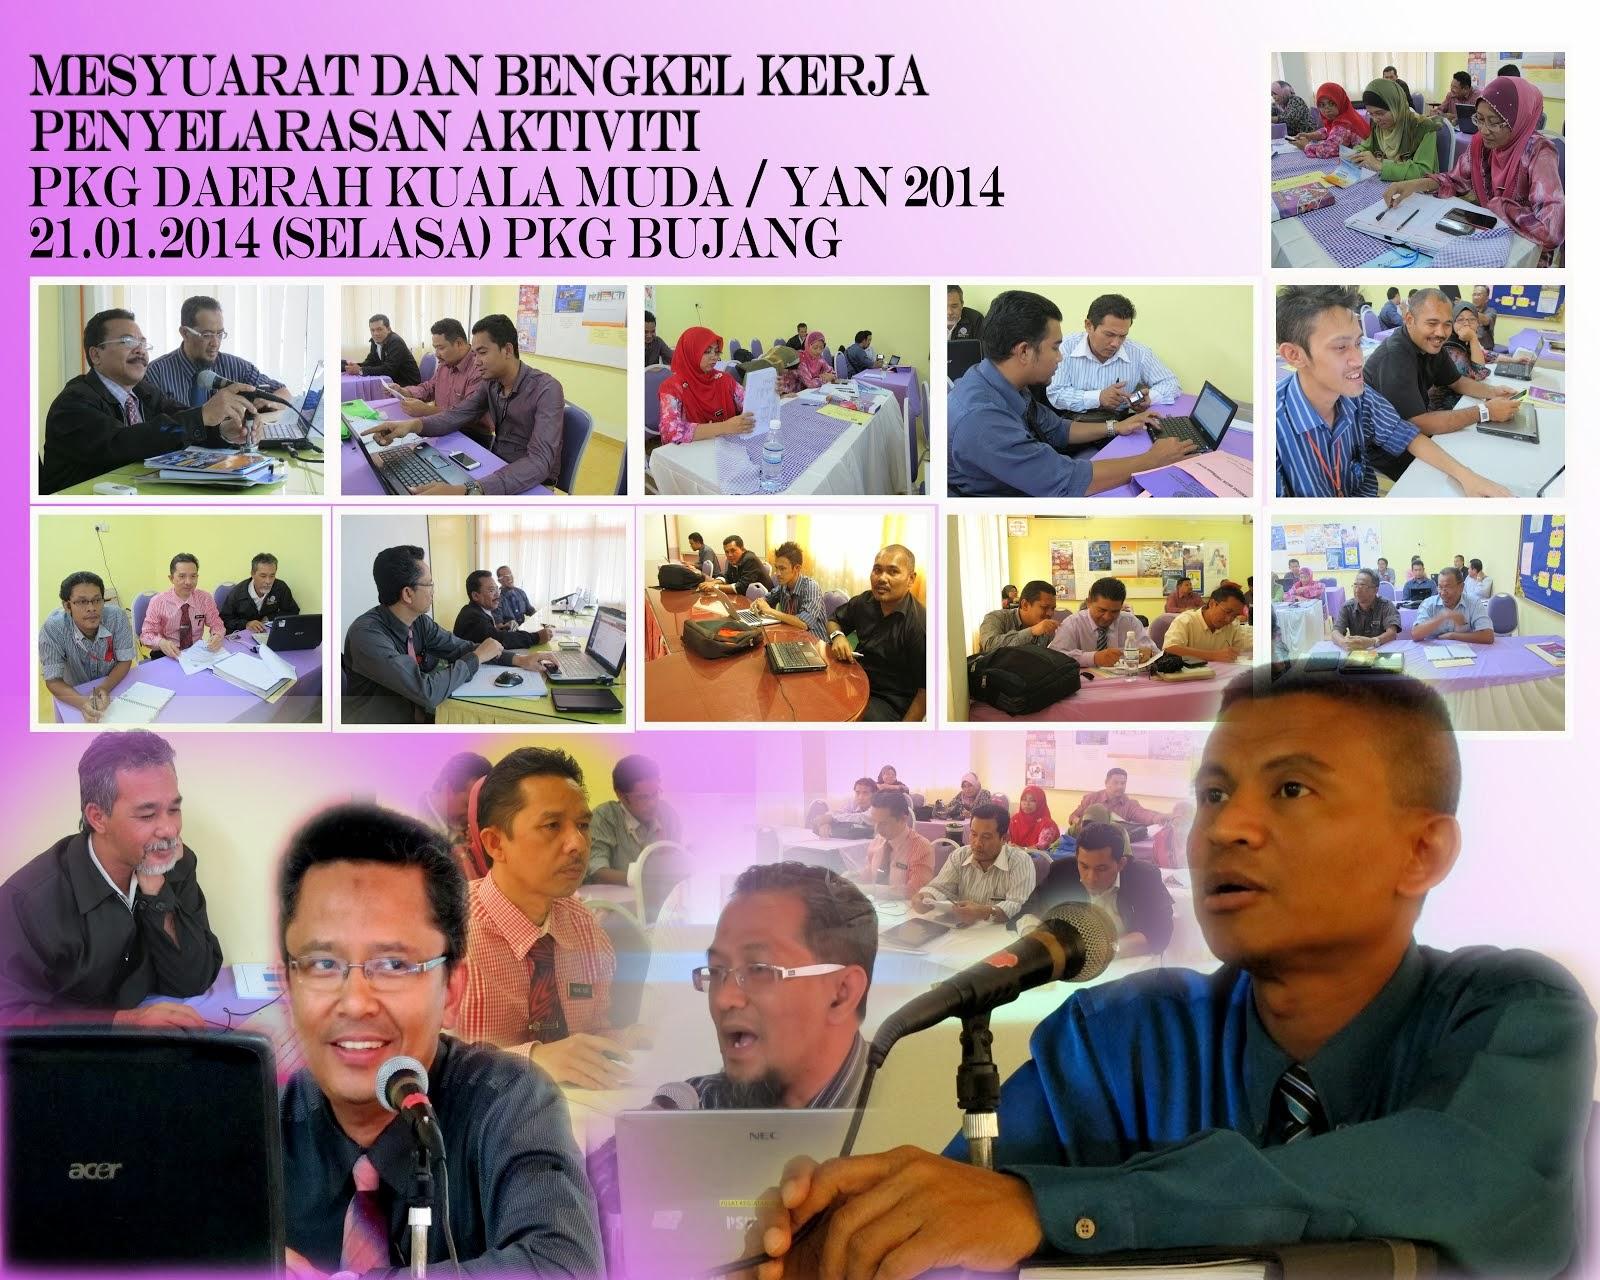 Mesyuarat & Bengkel SKT 2014 Daerah Kula Muda Yan